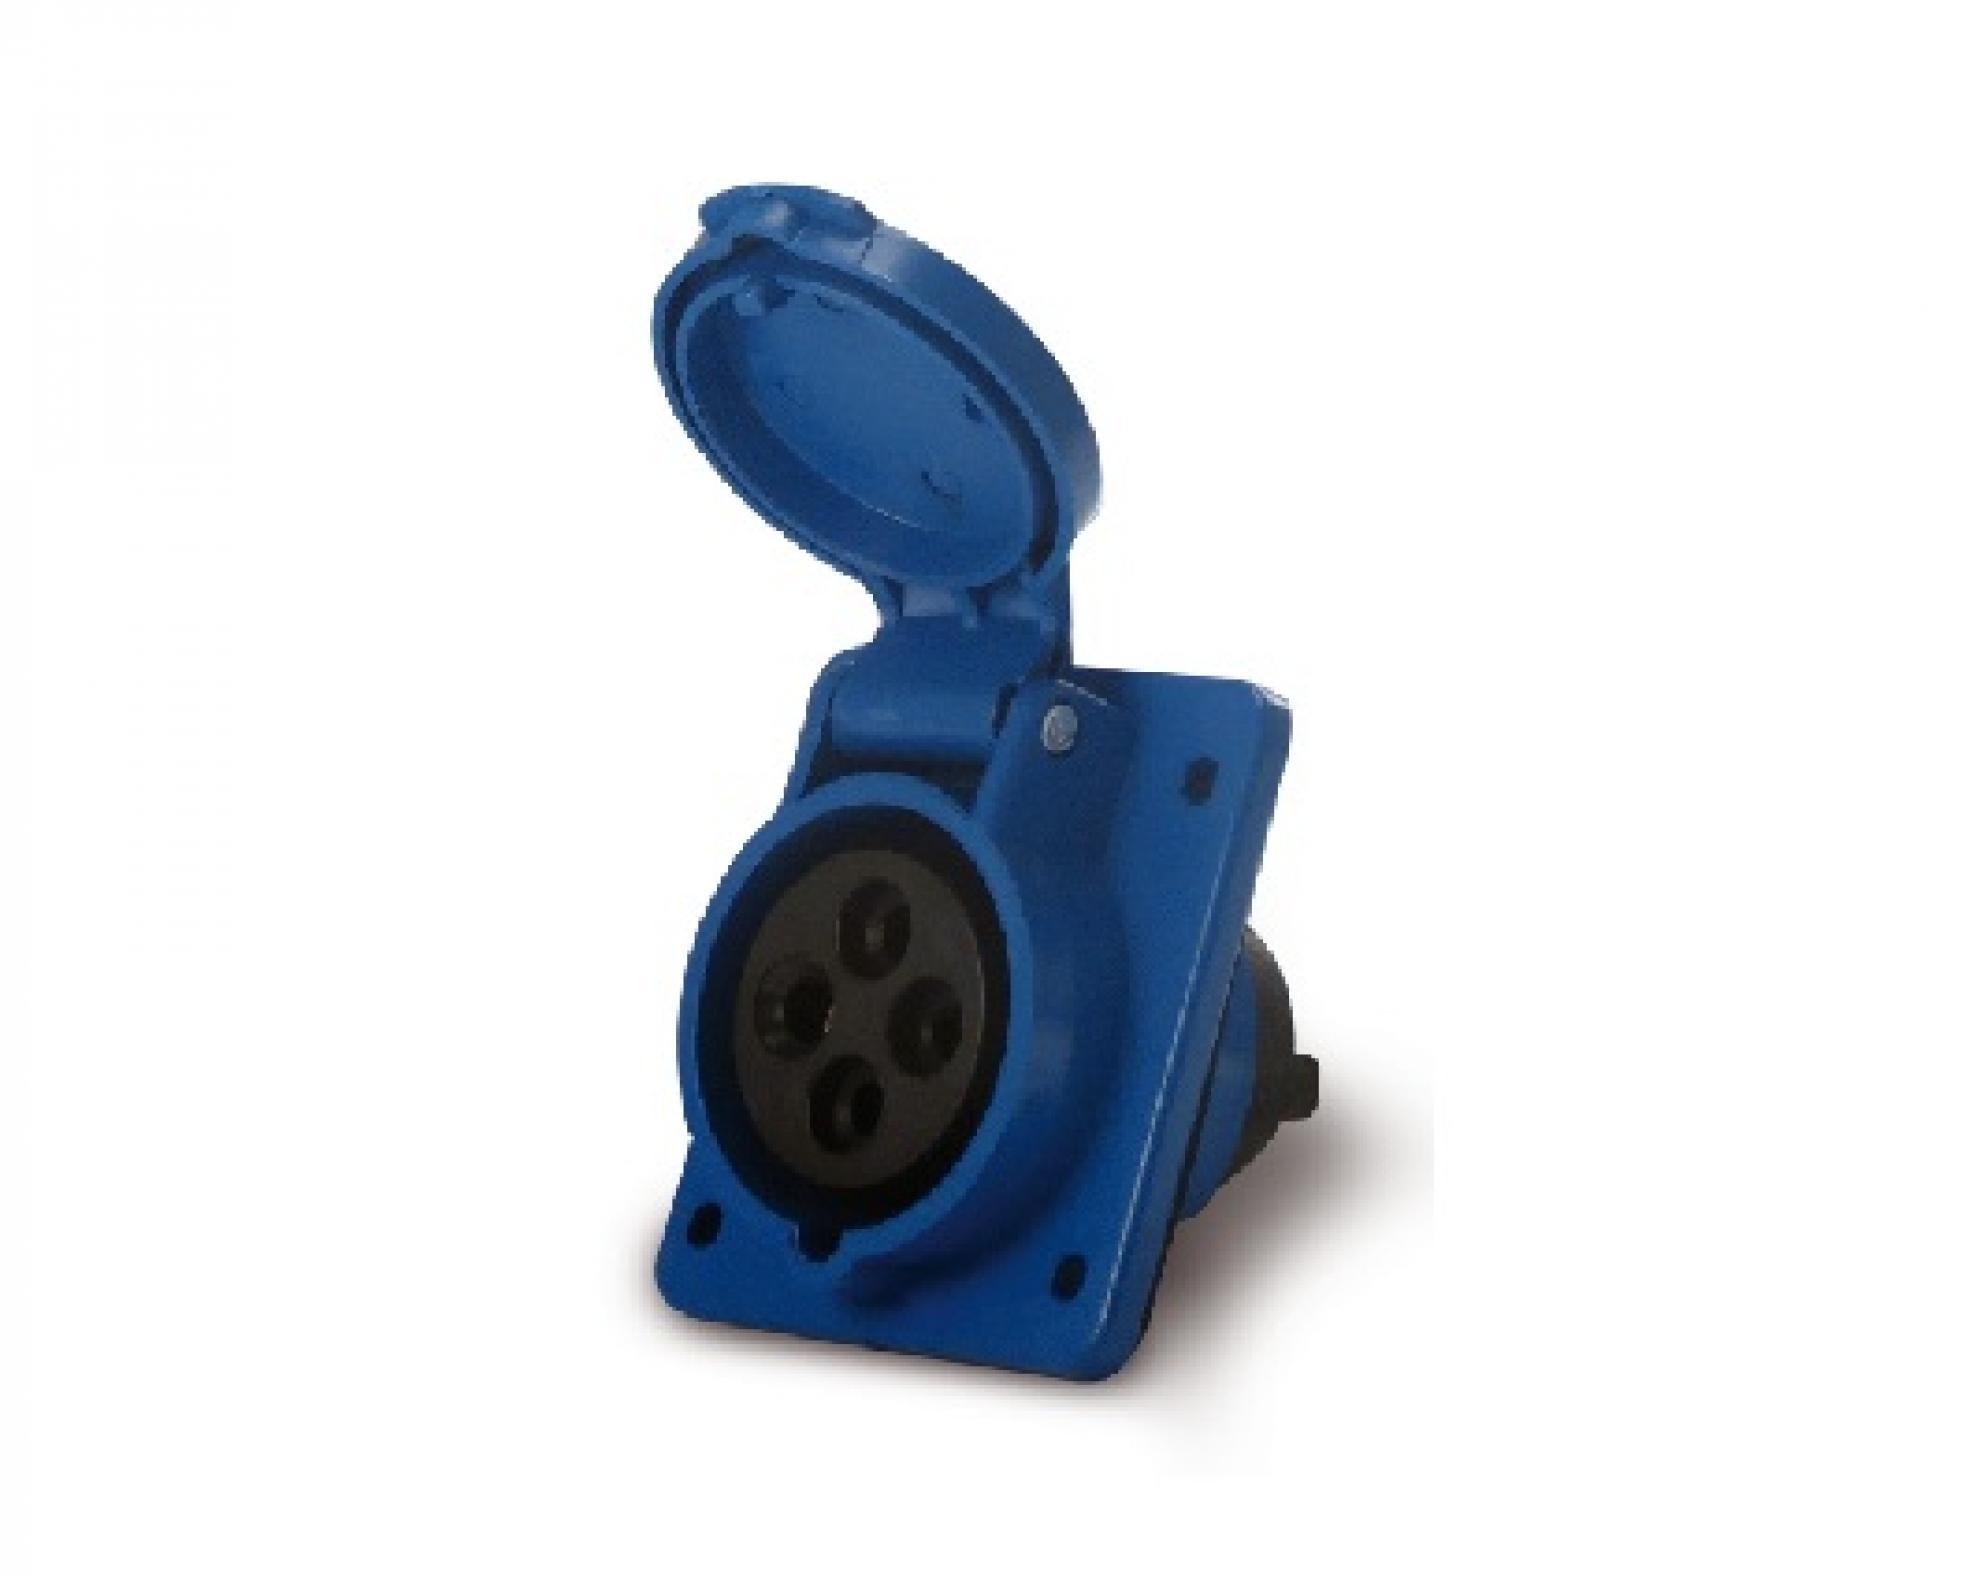 Tomada industrial embutida 3P+T 16A - 220V